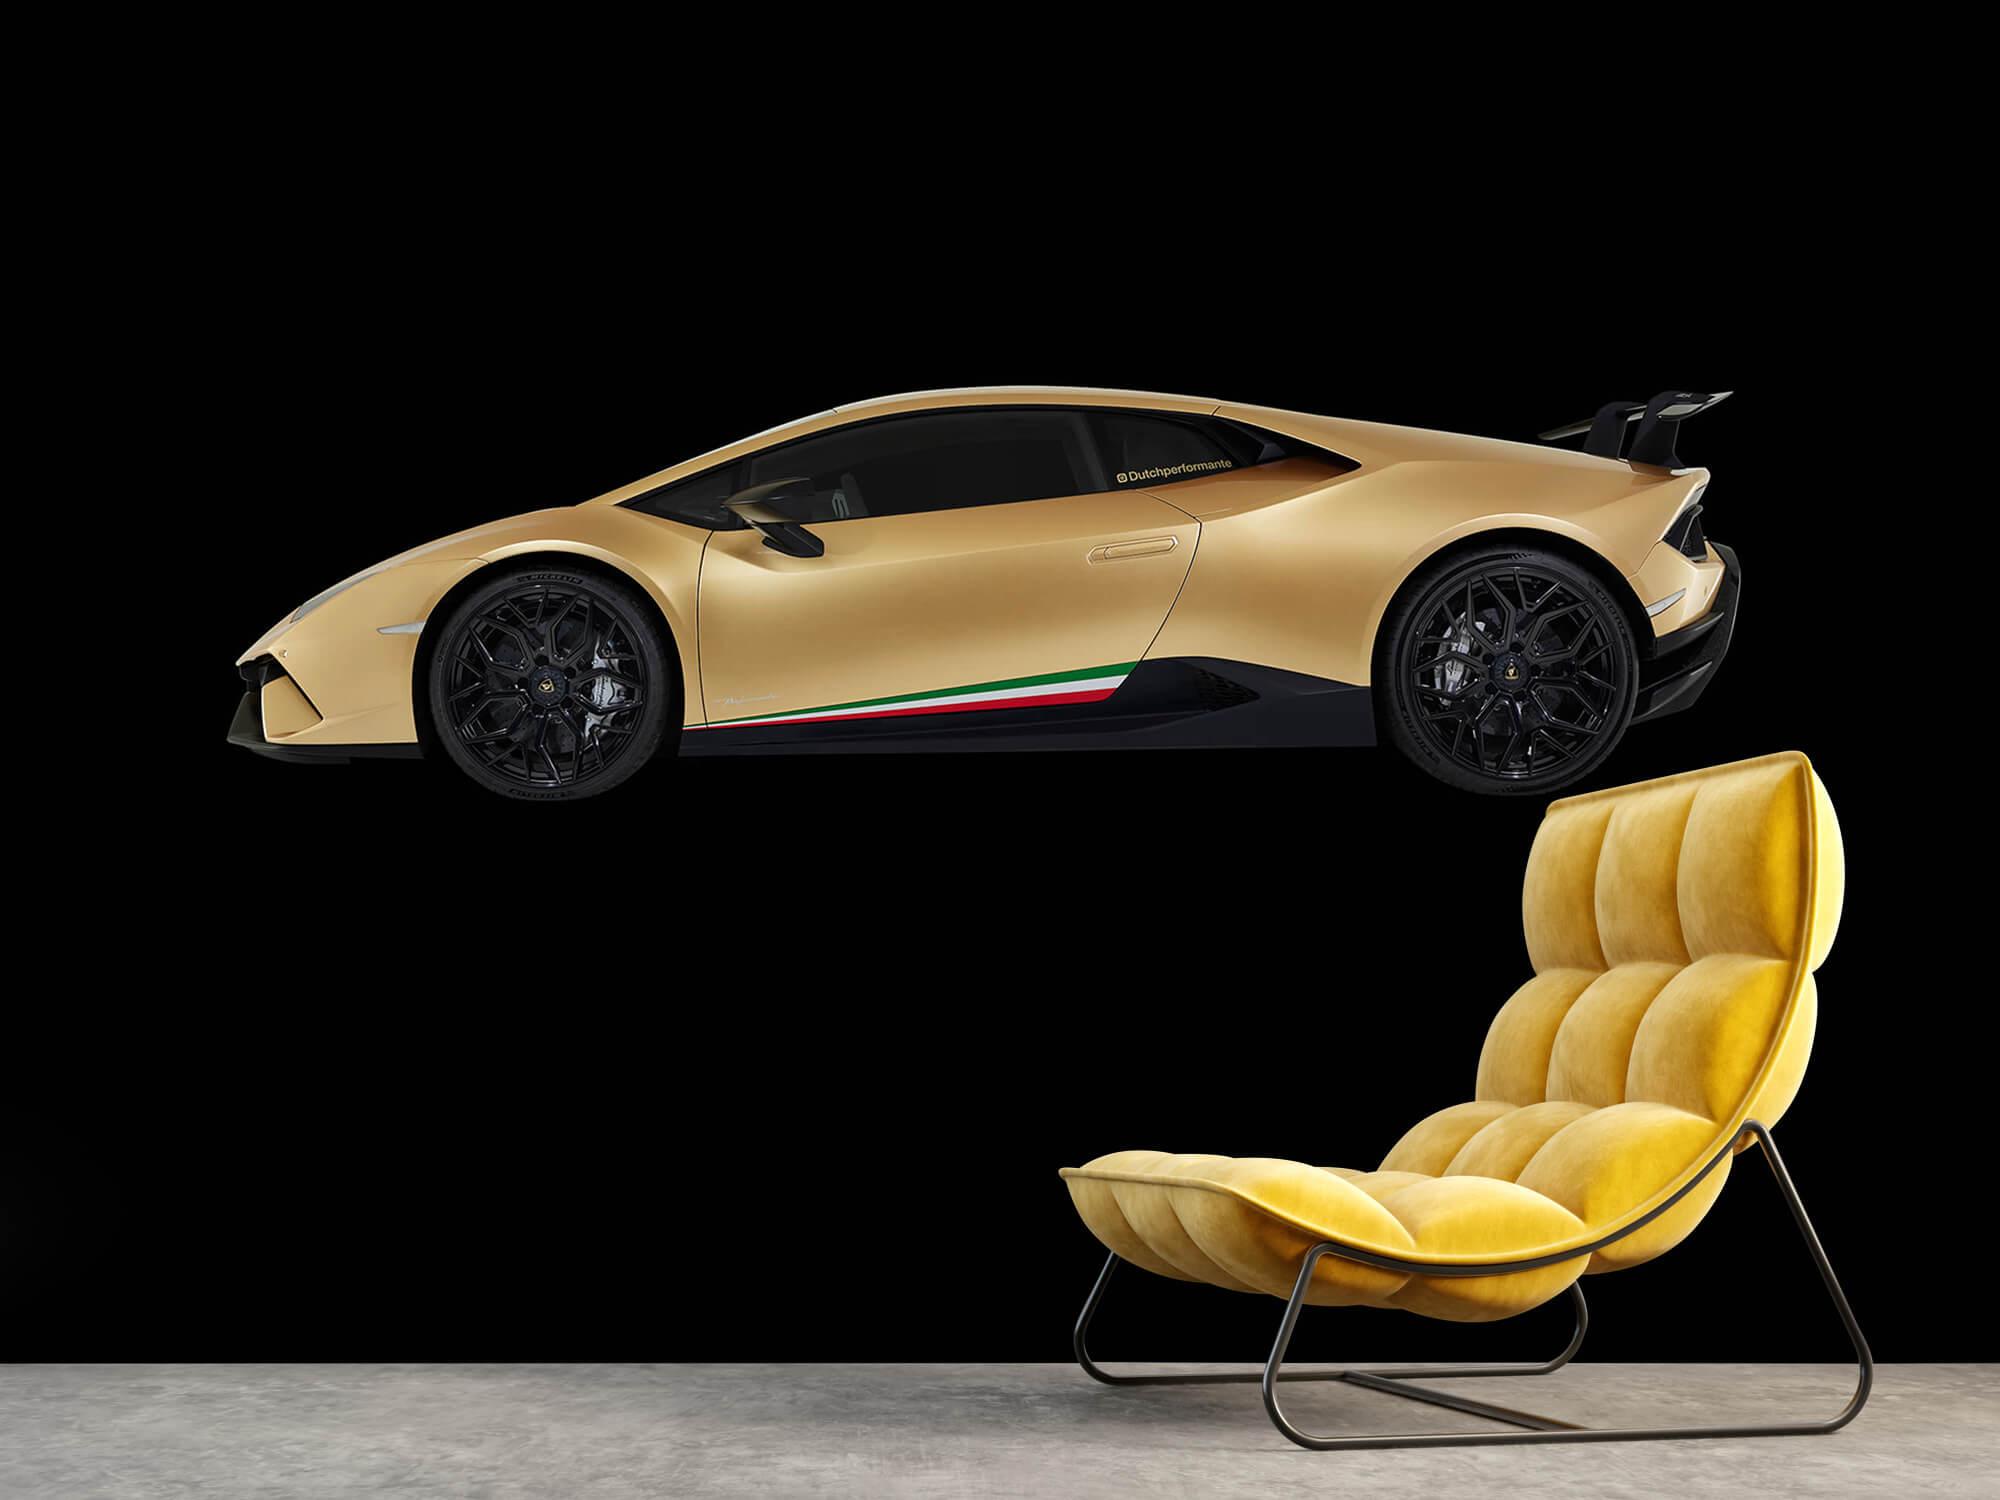 Wallpaper Lamborghini Huracán - Côté, noir 3